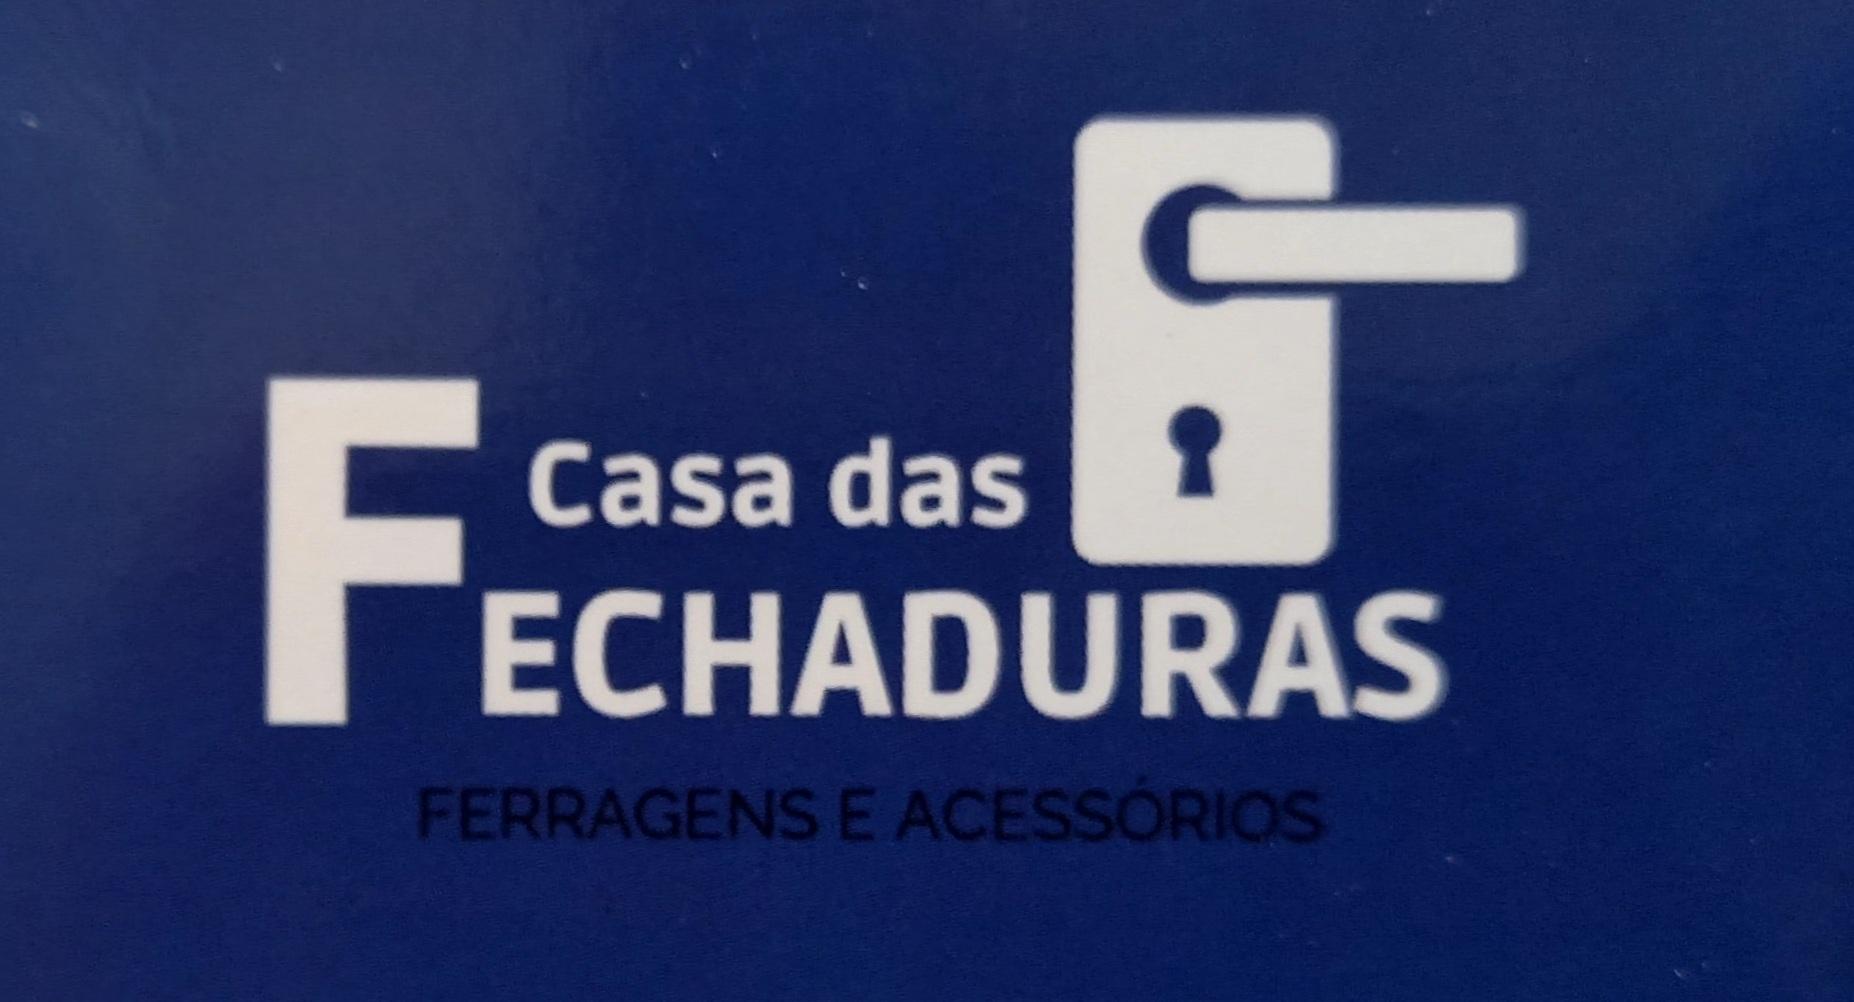 CASA DAS FECHADURAS